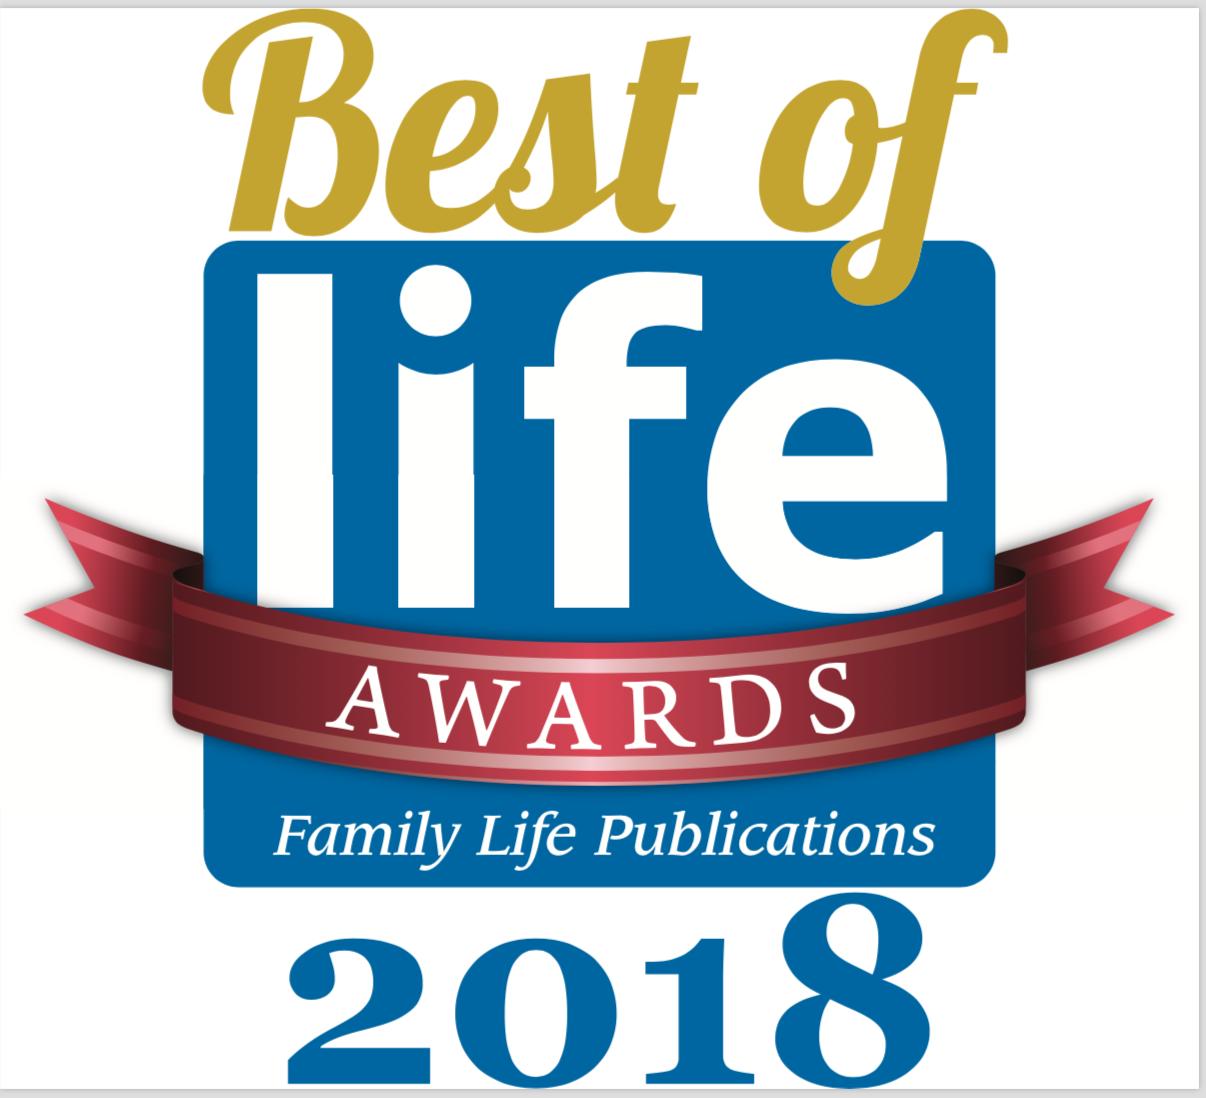 familylifepublications/mikoandboonehome